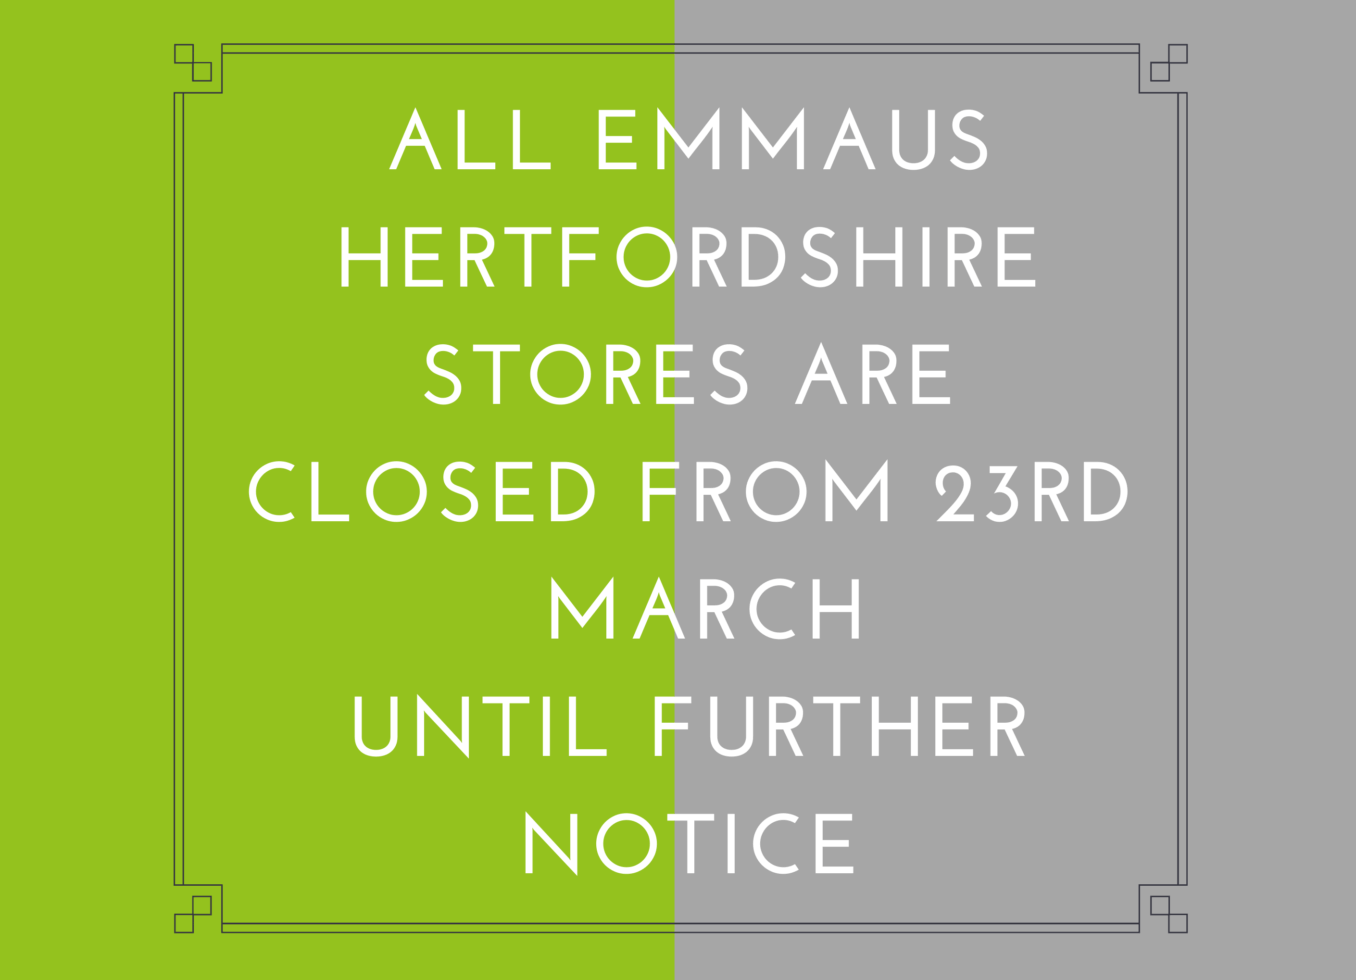 Temporary closure of Emmaus Hertfordshire stores